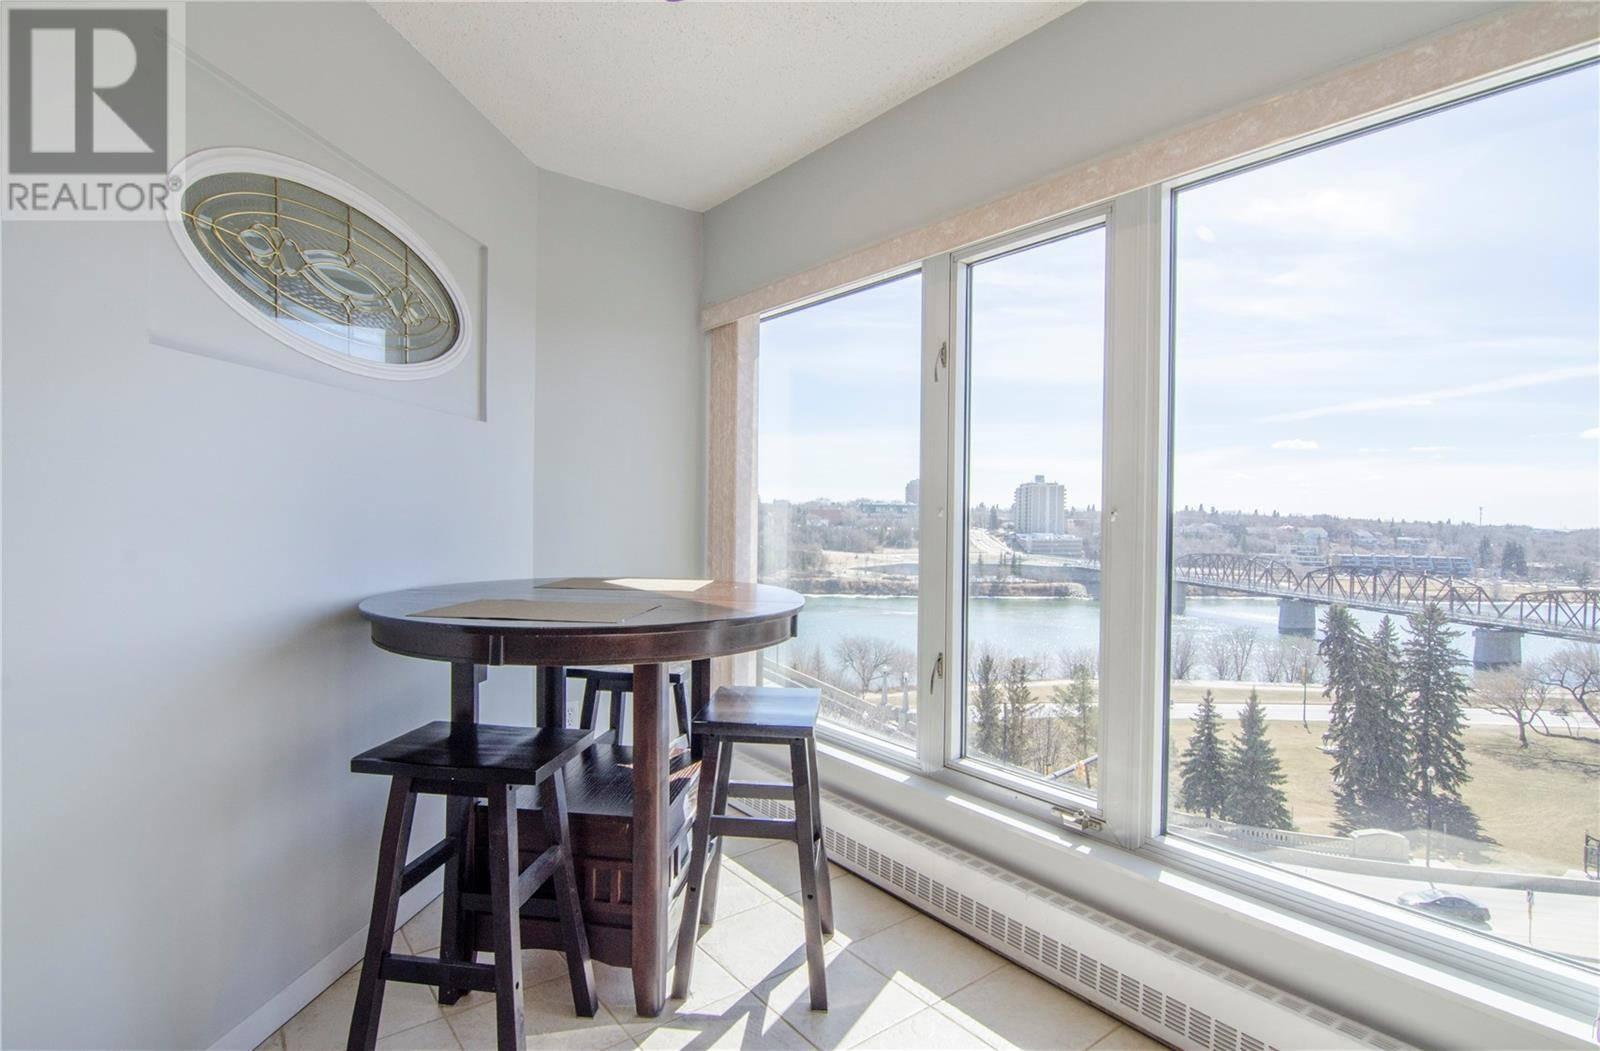 Condo for sale at 424 Spadina Cres E Unit 960 Saskatoon Saskatchewan - MLS: SK788573